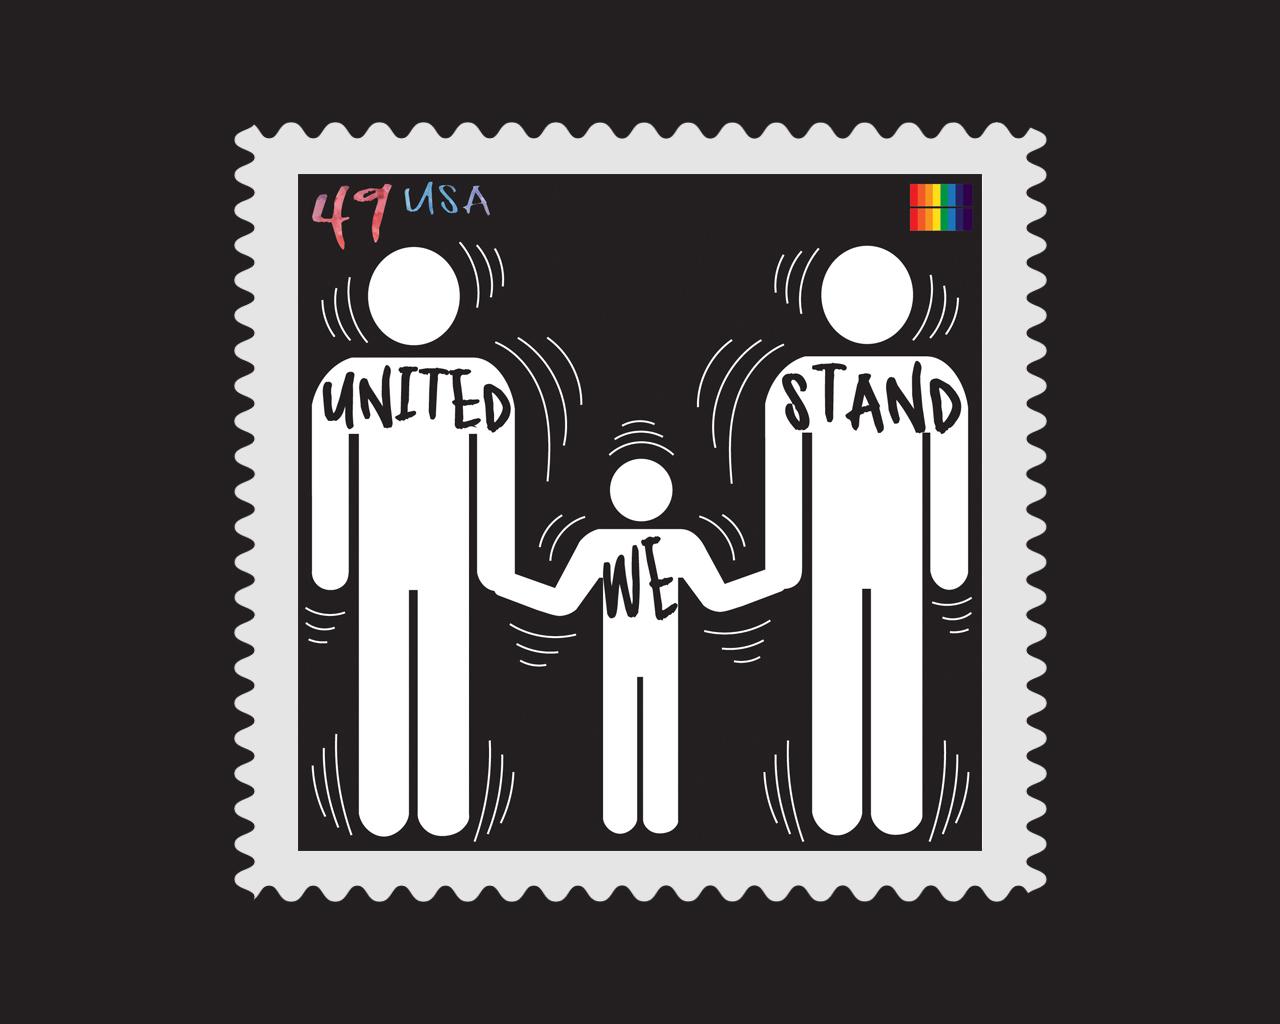 Stamp 2.jpg